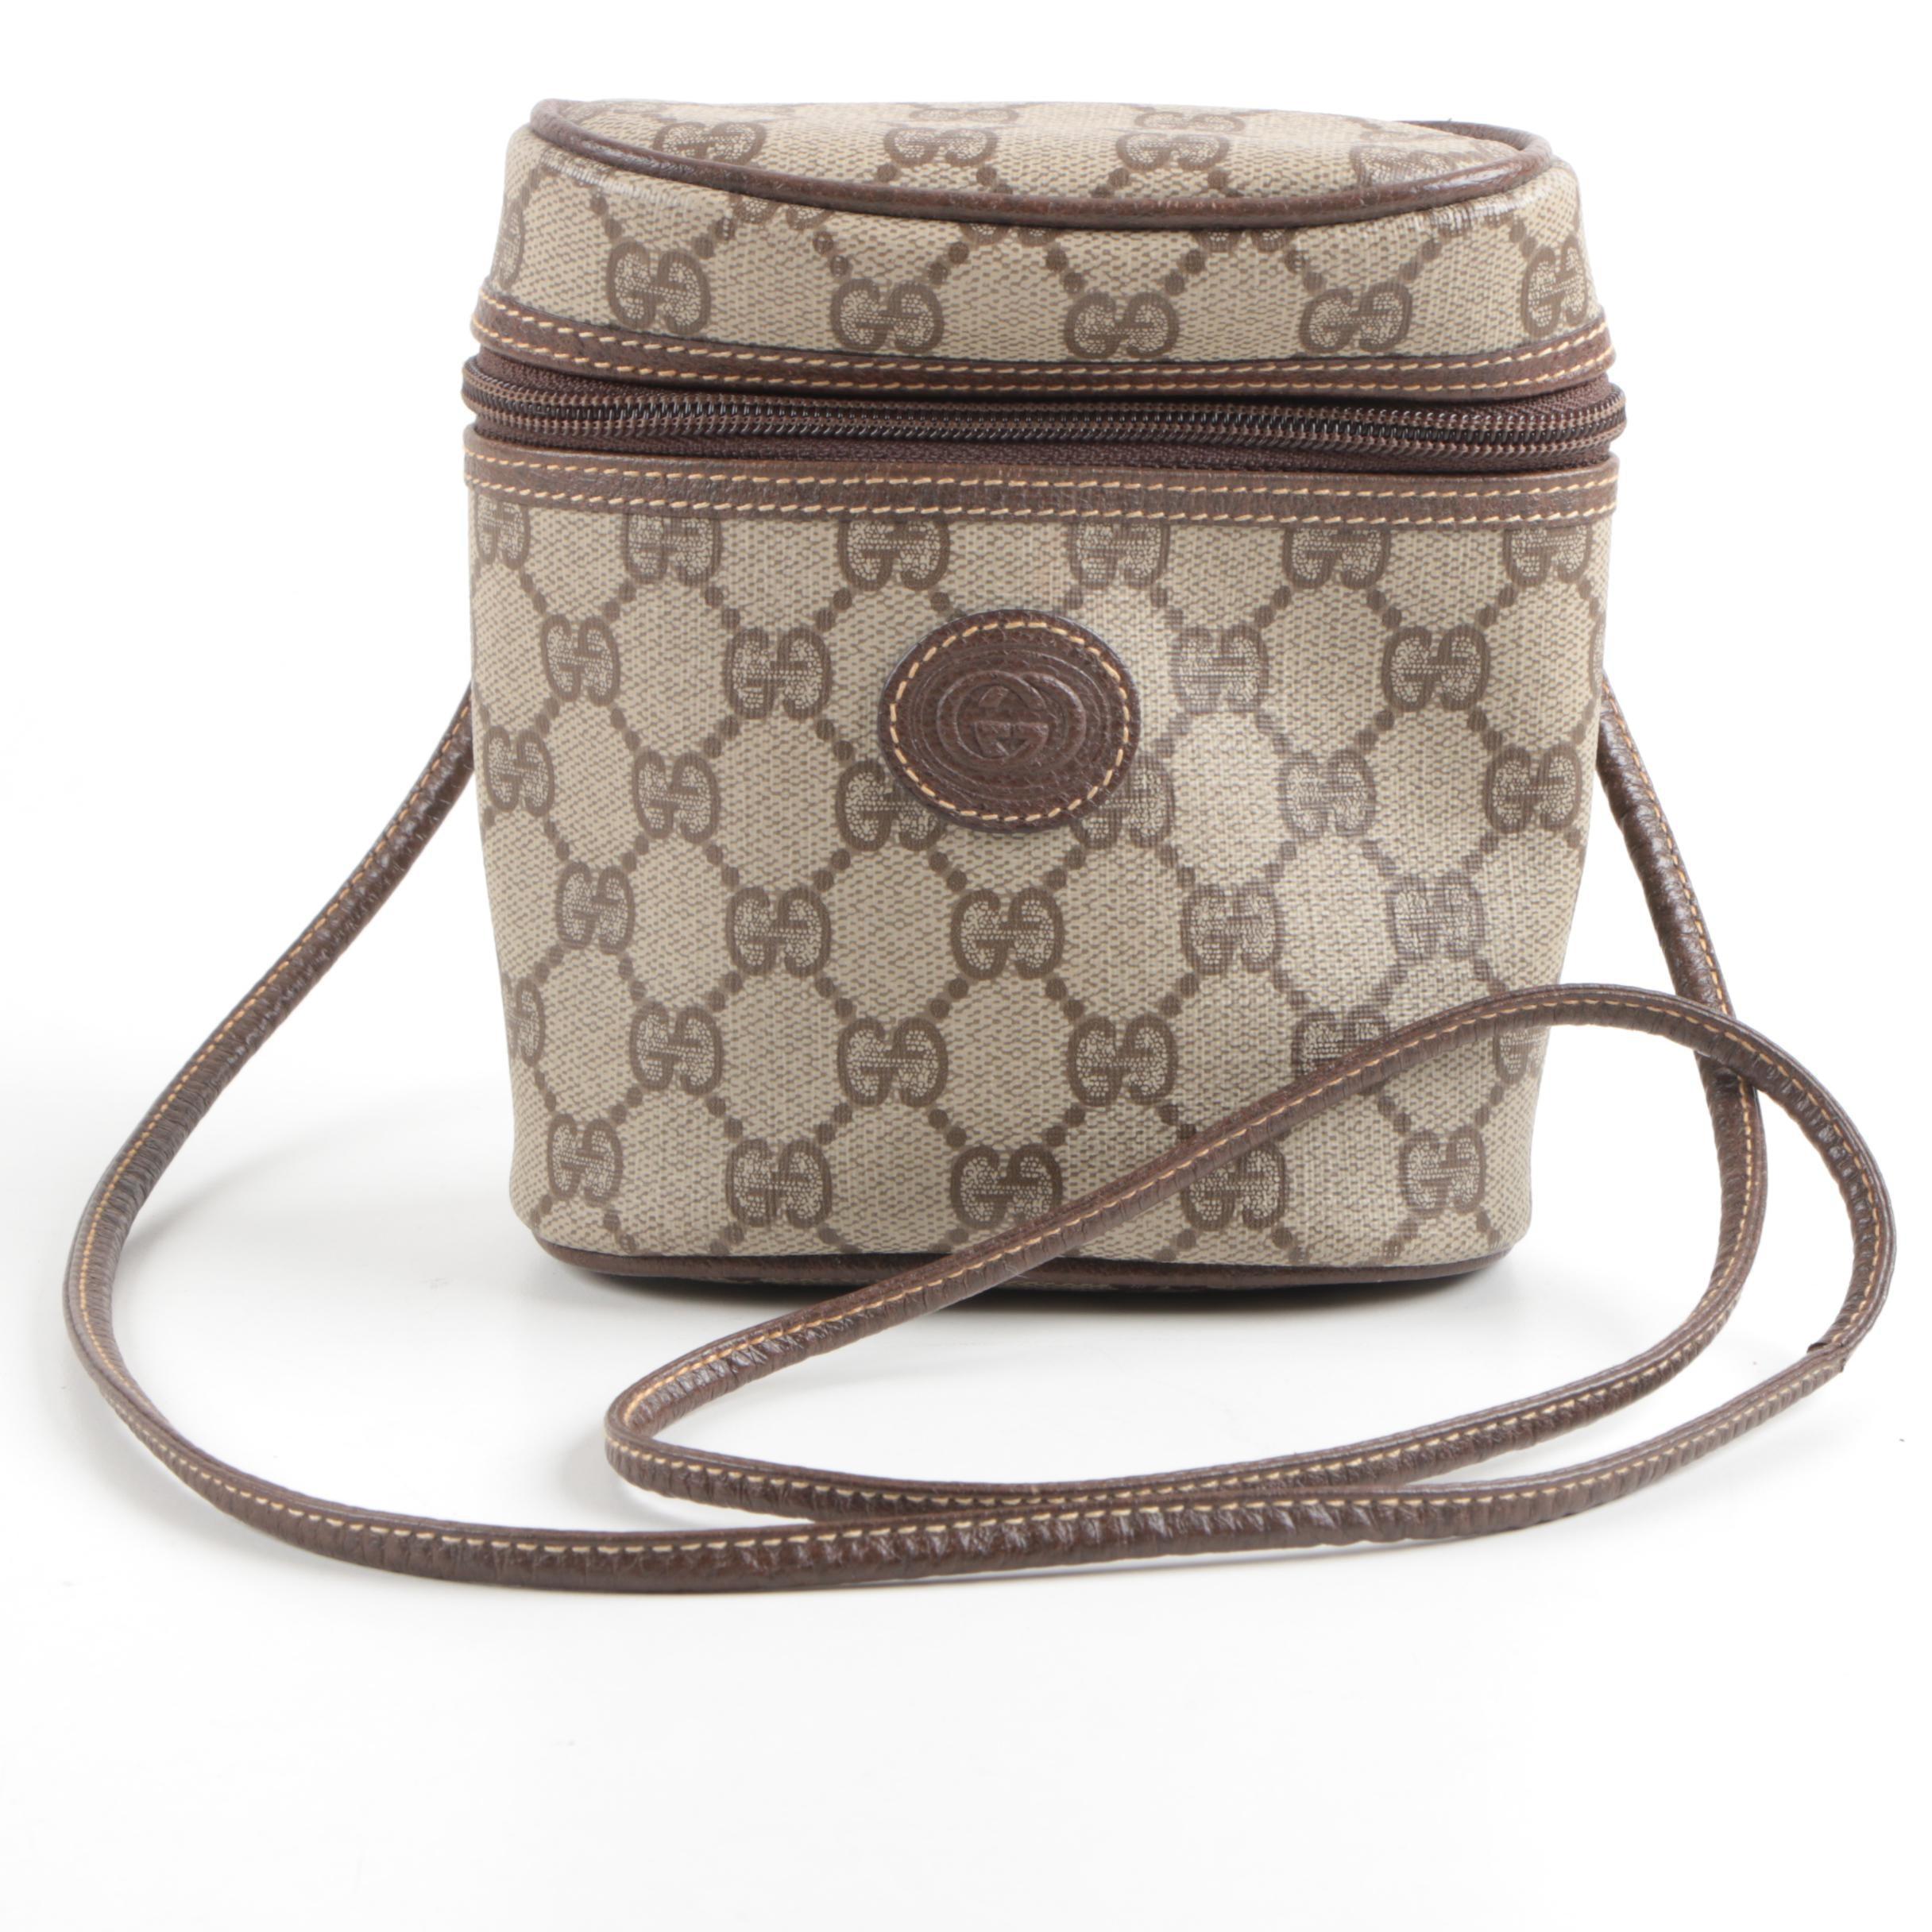 Gucci Monogrammed Canvas Cross-Body Bag